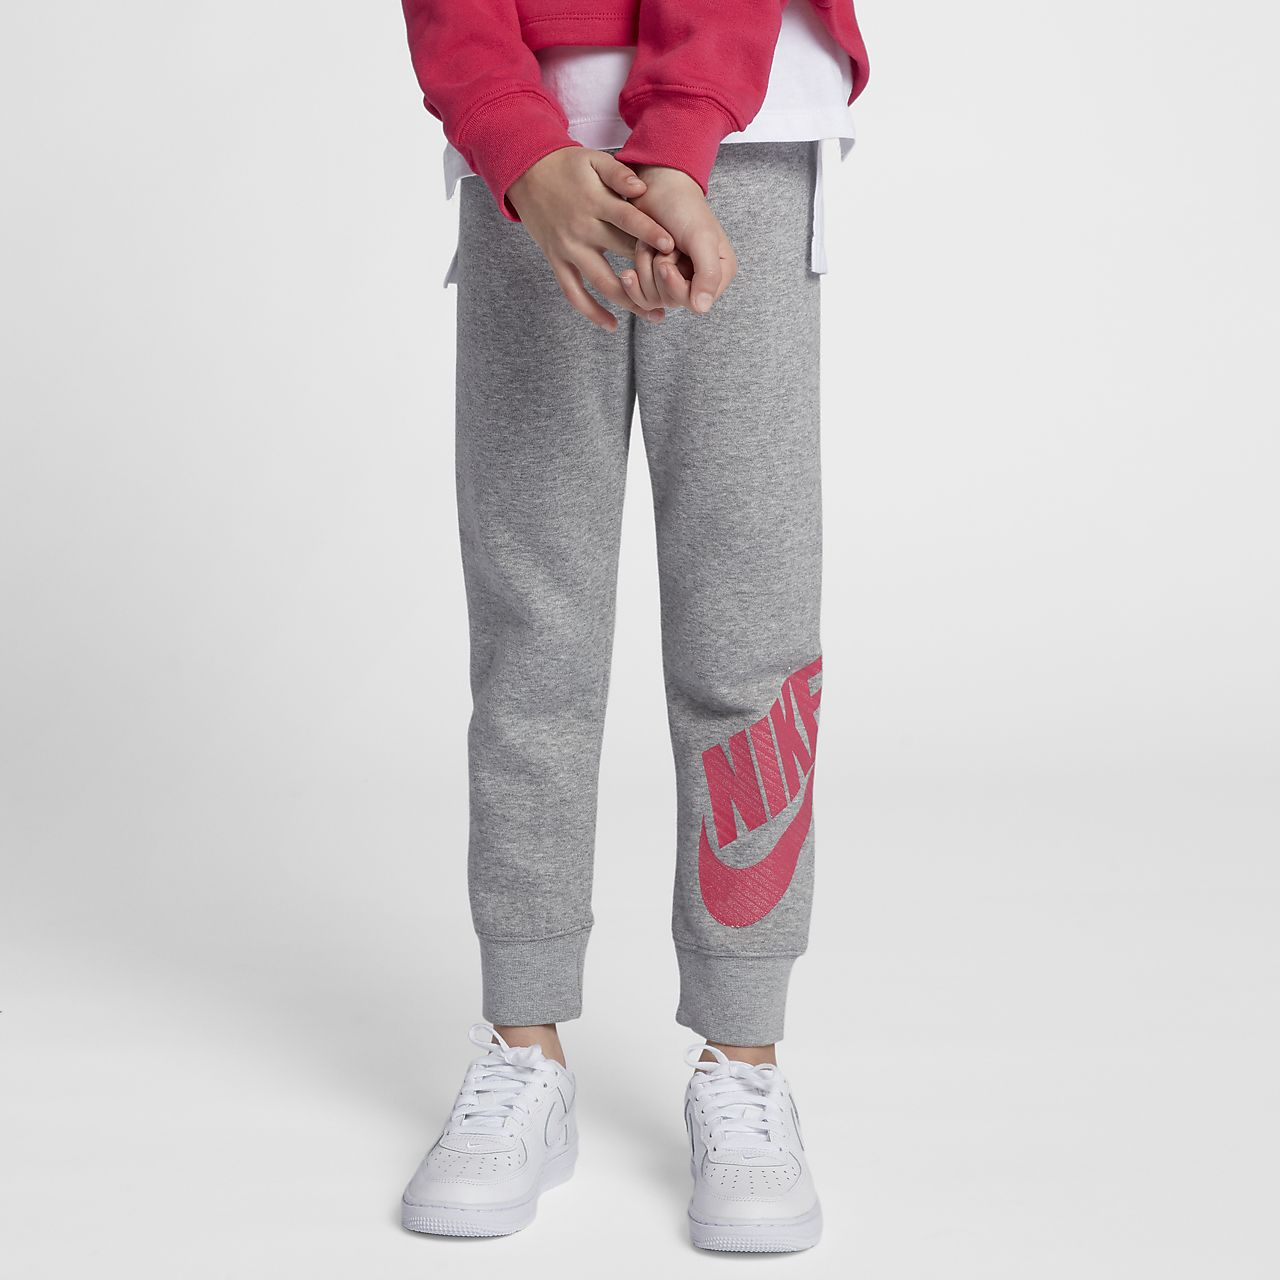 Nike Sportswear Jogger für jüngere Kinder